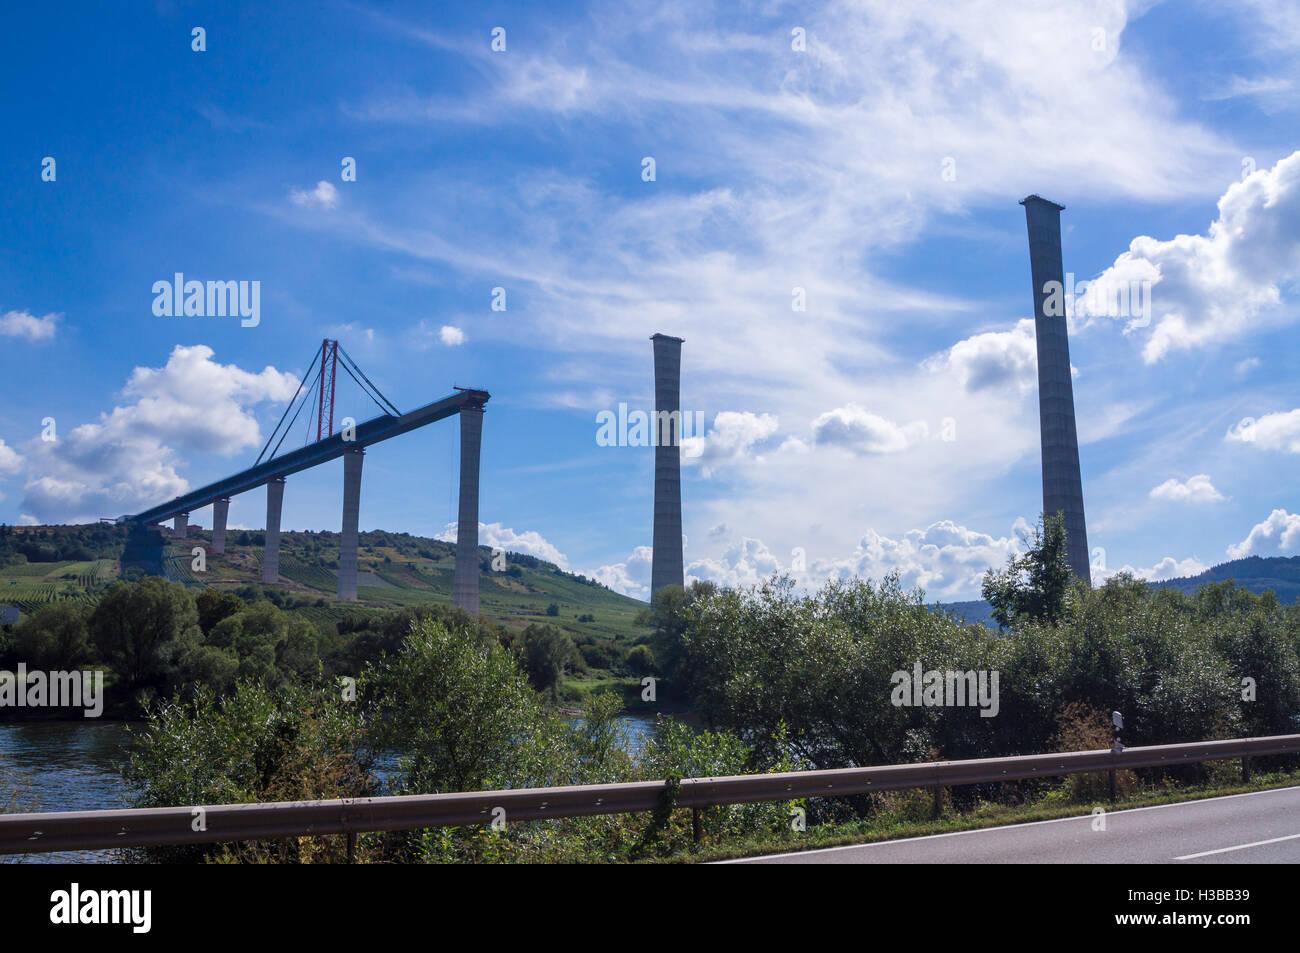 Unfinished Hochmoselübergang B50 motorway bridge, Ürzig, Mosel, Germany - Stock Image